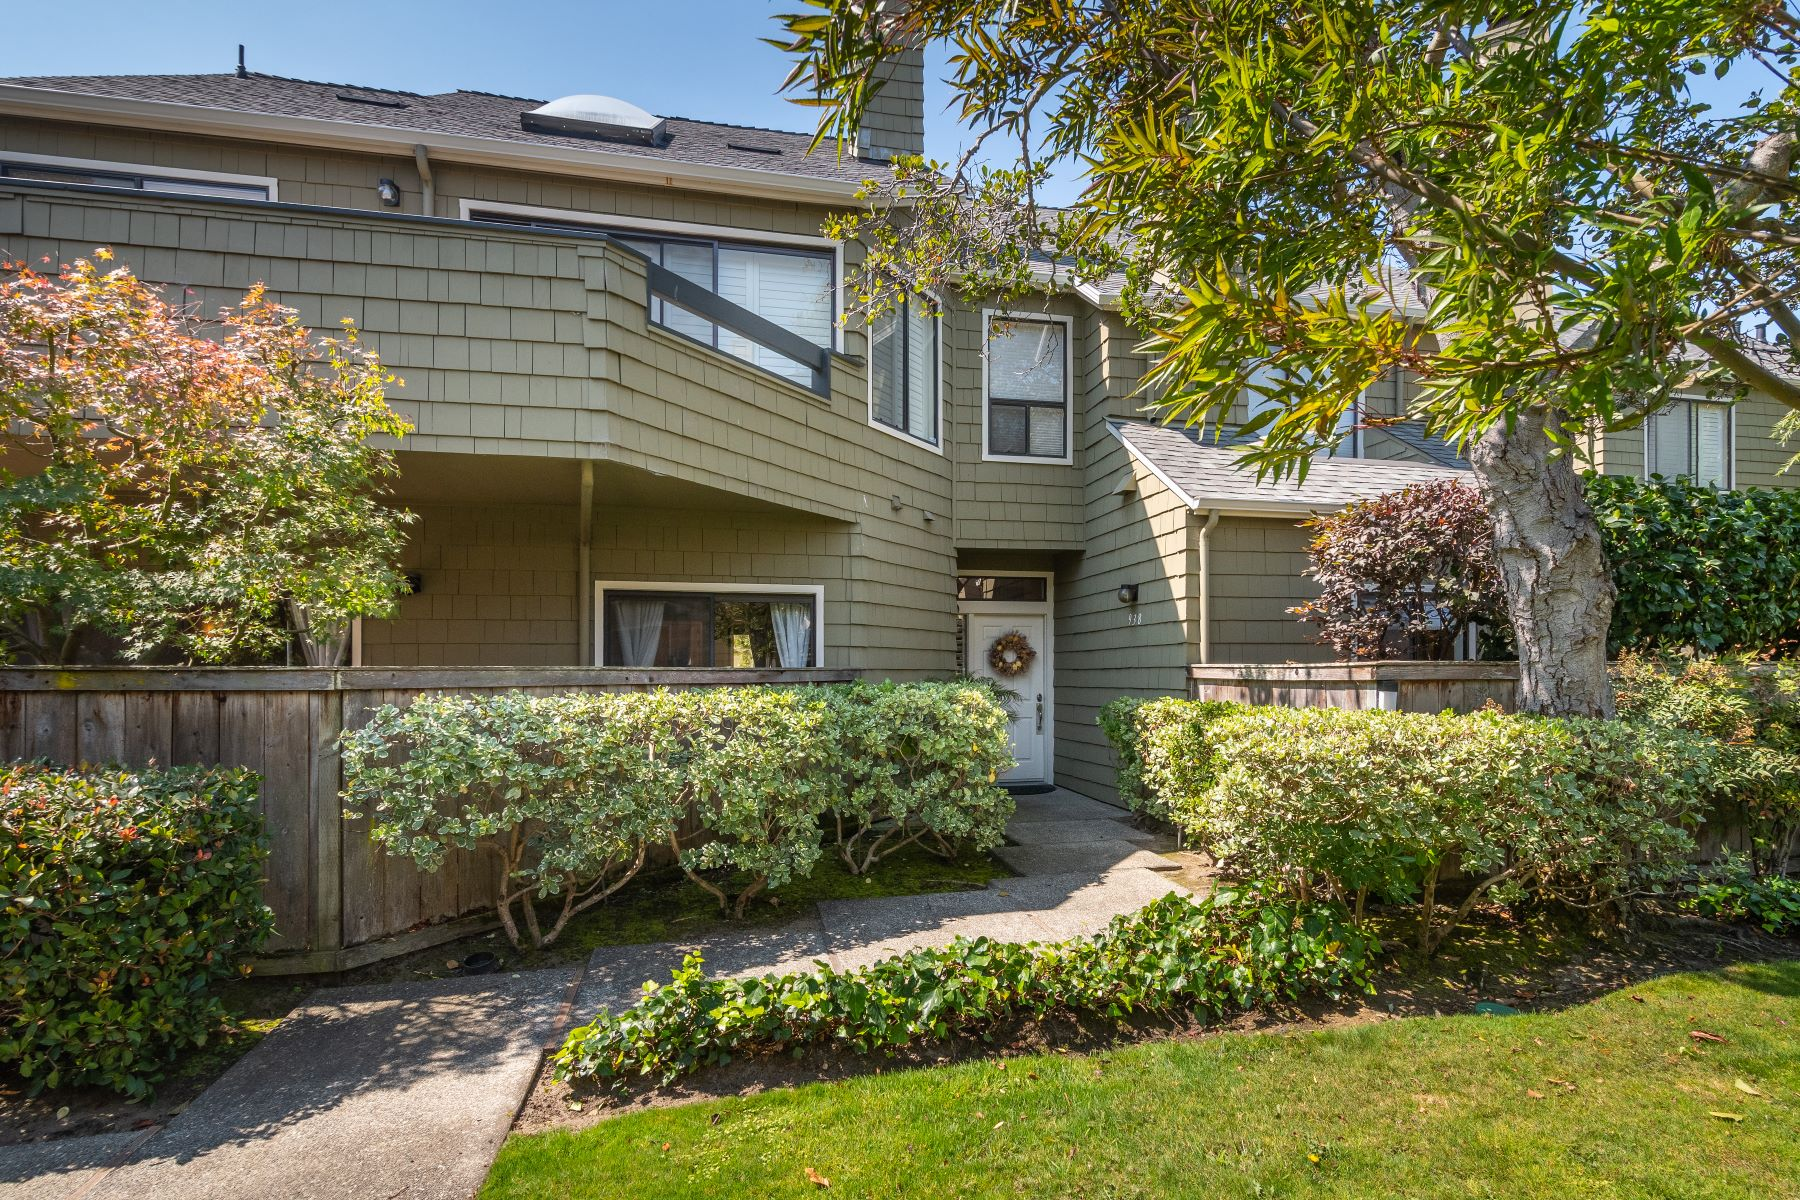 Condominiums 为 销售 在 Elegant Ground Floor Unit with Greenbelt and San Mateo Lagoon Views 938 Shoreline Drive 圣马特奥市, 加利福尼亚州 94404 美国